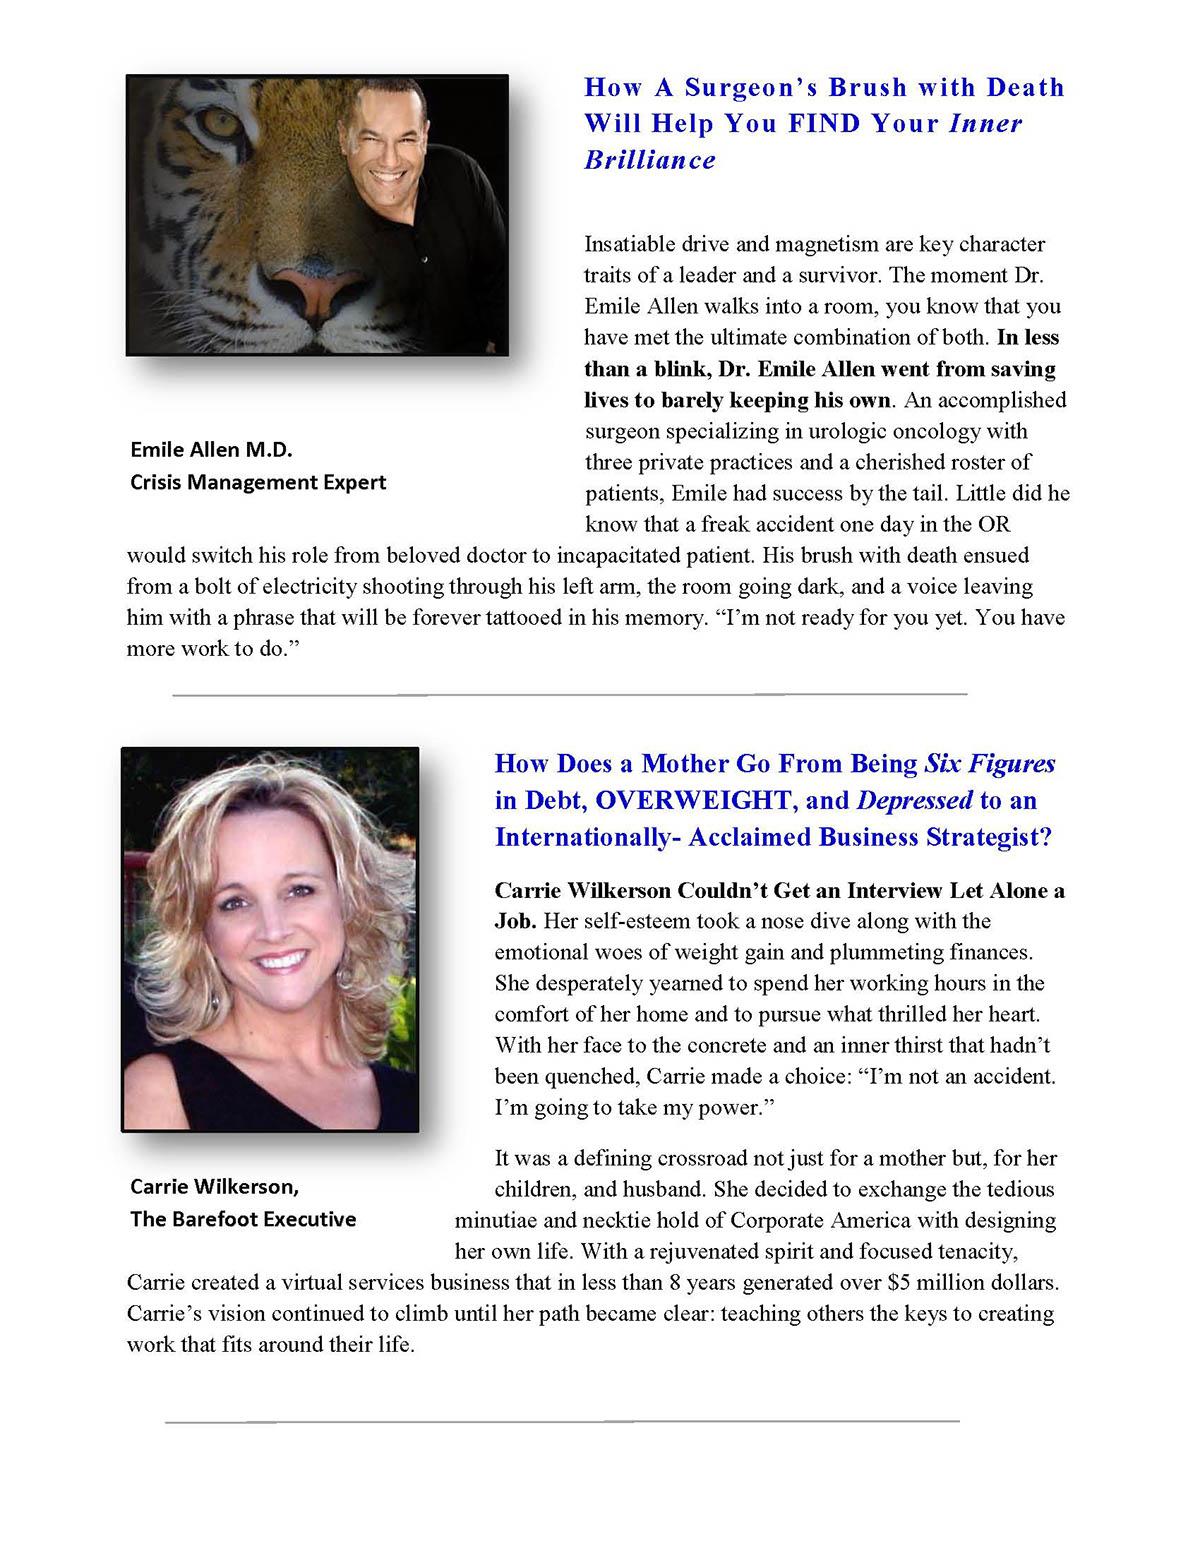 lisa cafiero Executive Biographies corporate biographies brand strategy speaker Keynote Speaker one sheet biographies Executive Profile LinkedIn Profile